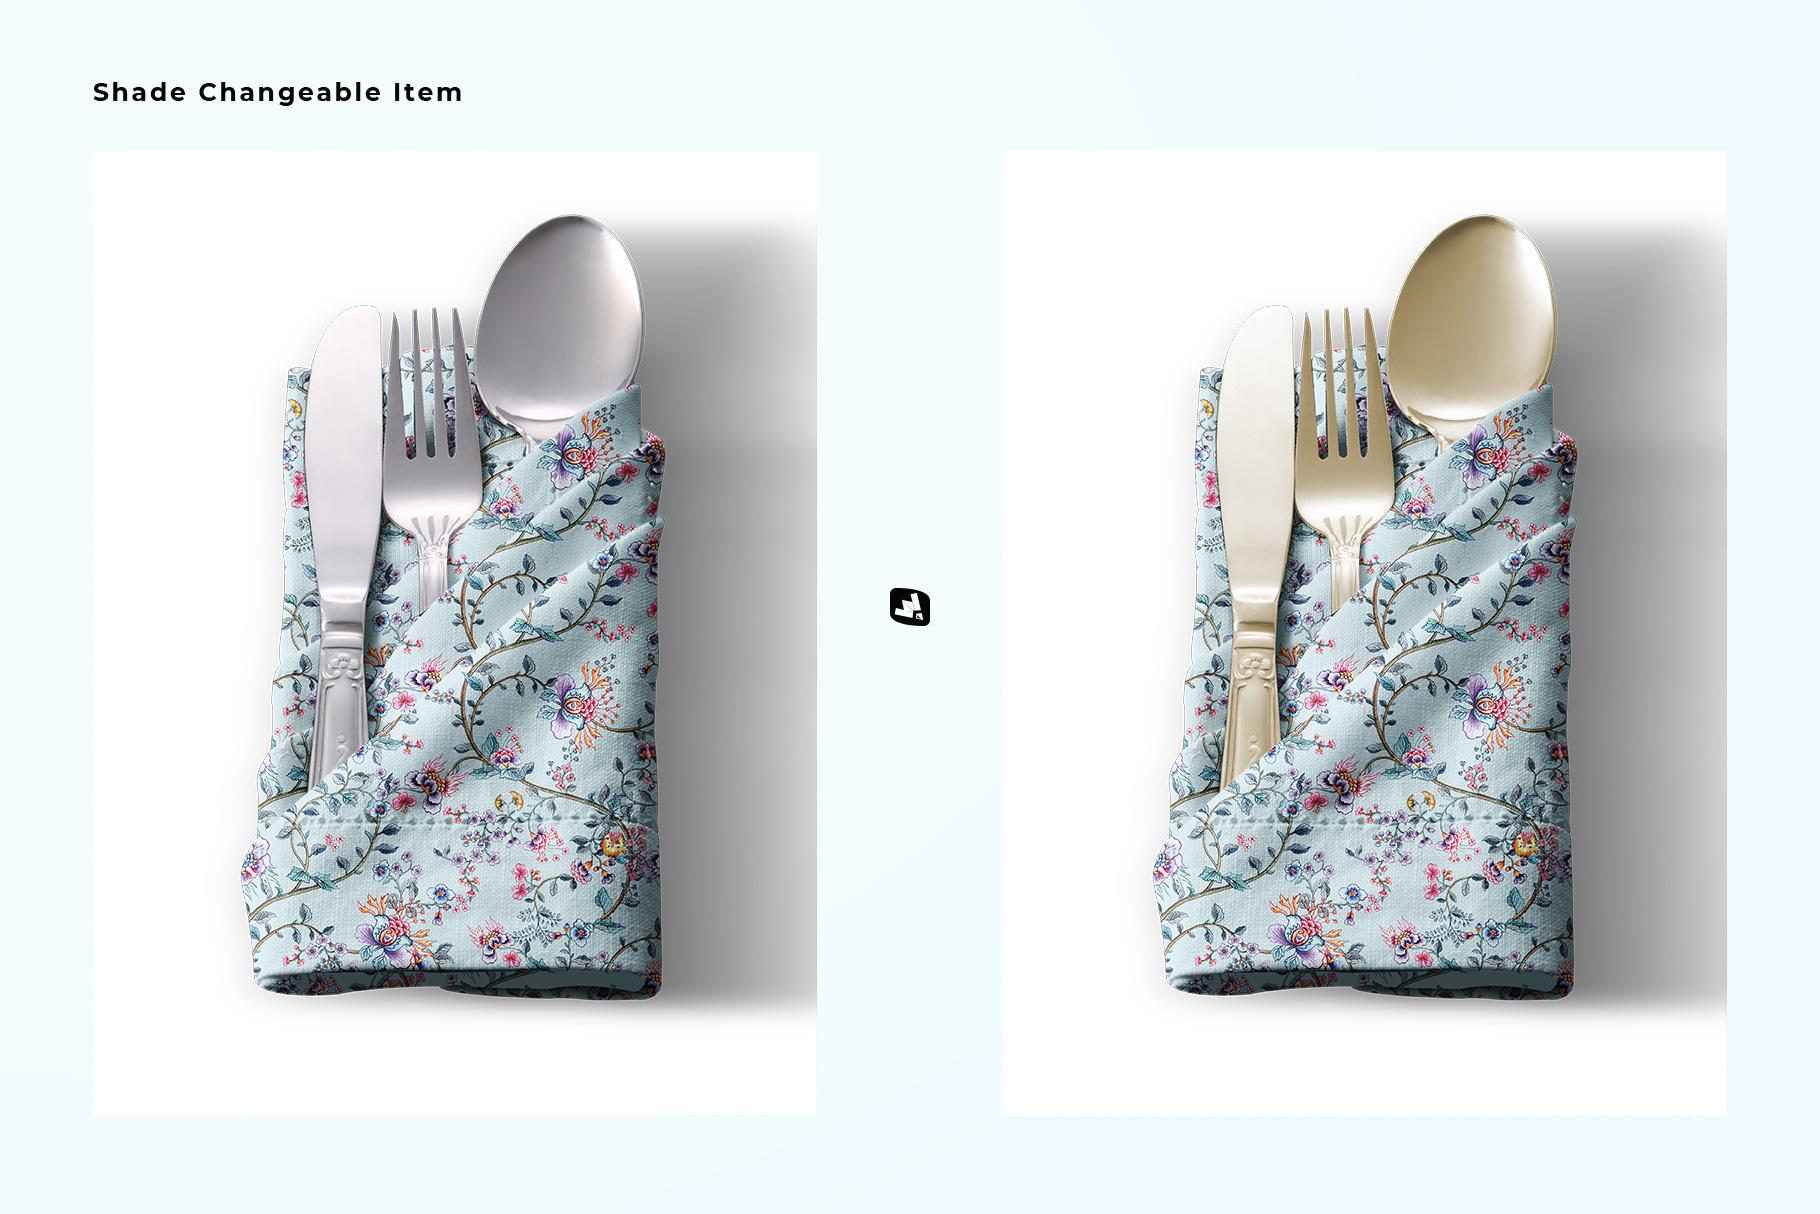 changeable utensils of the folded napkin with utensils mockup